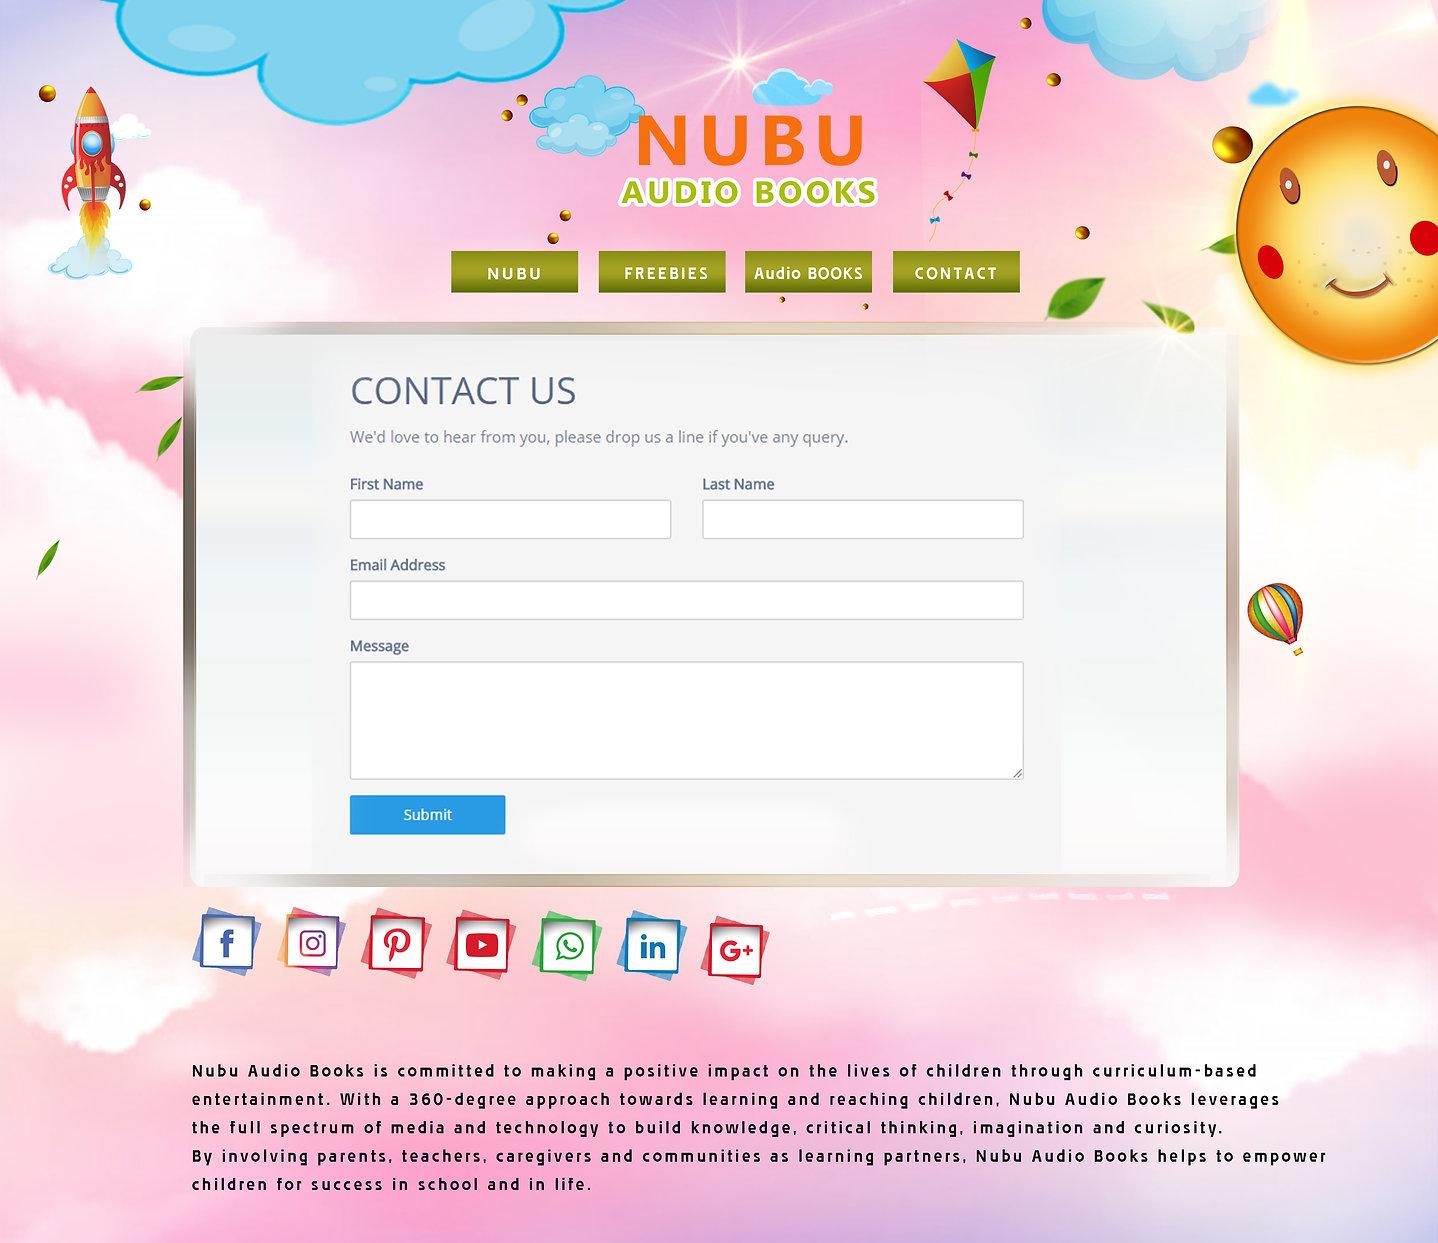 NUBU AUDIO BOOKS contact.jpg